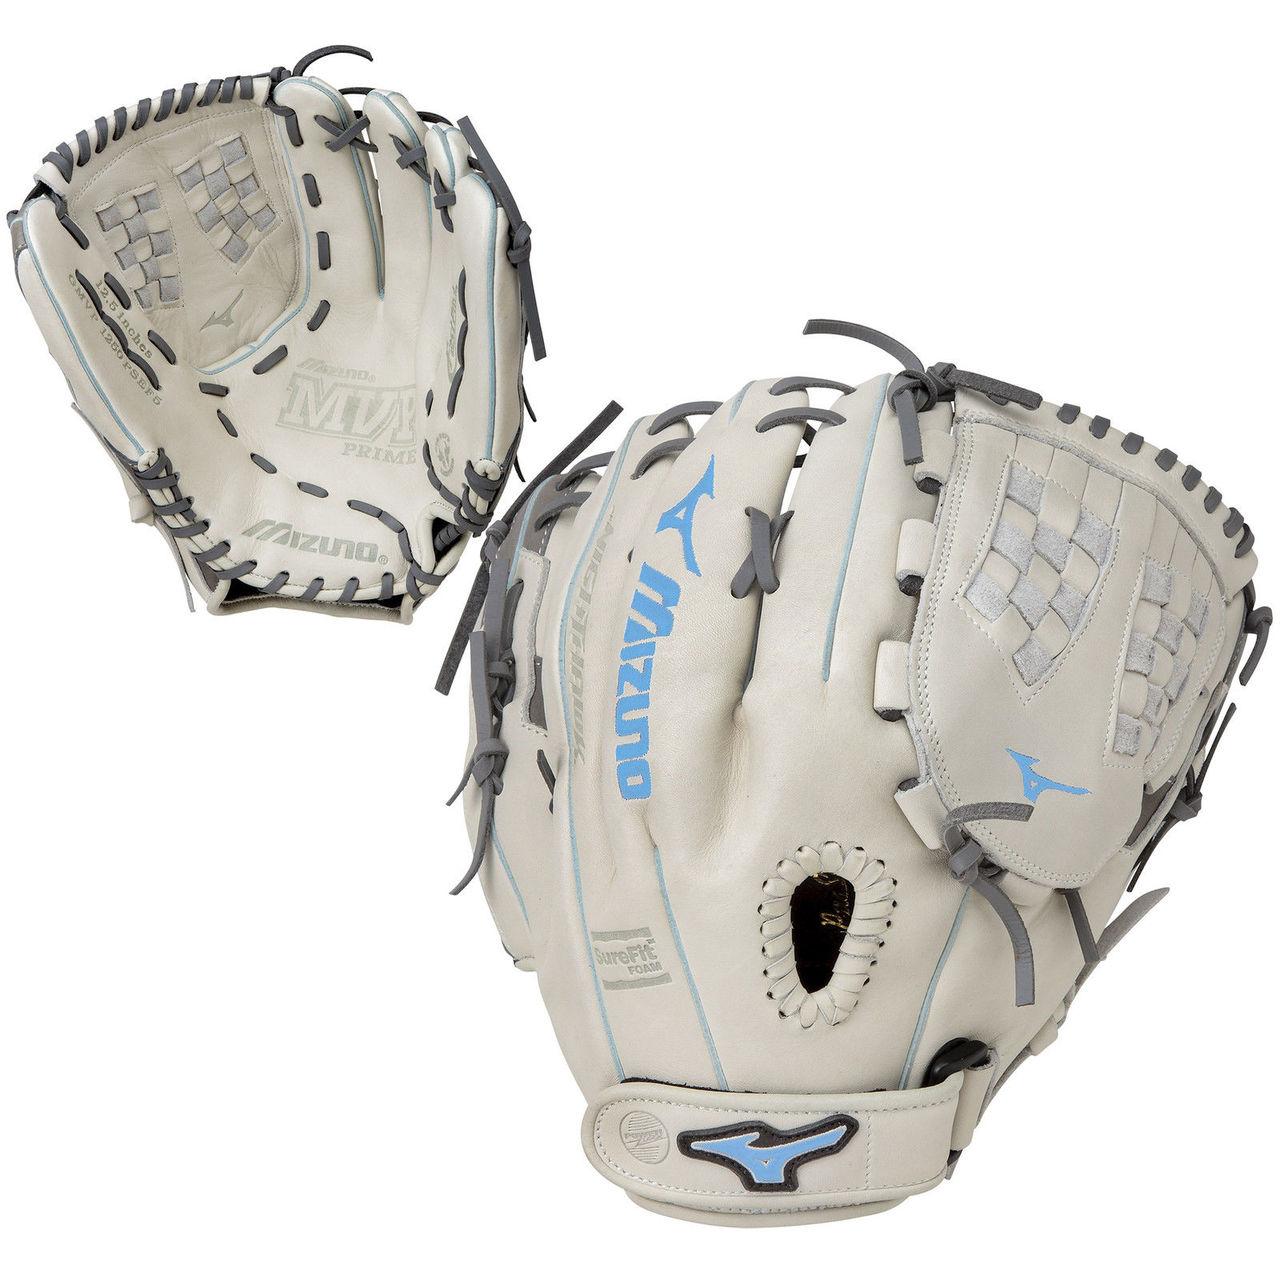 mizuno-mvp-prime-se-12-5-gmvp1250psef5-fastpitch-softball-glove-silver-grey-blue-right-hand-throw GMVP1250PSEF5-SIGRBL-RightHandThrow  889961059797 The MVP Prime SE fastpitch softball series gloves feature a Center